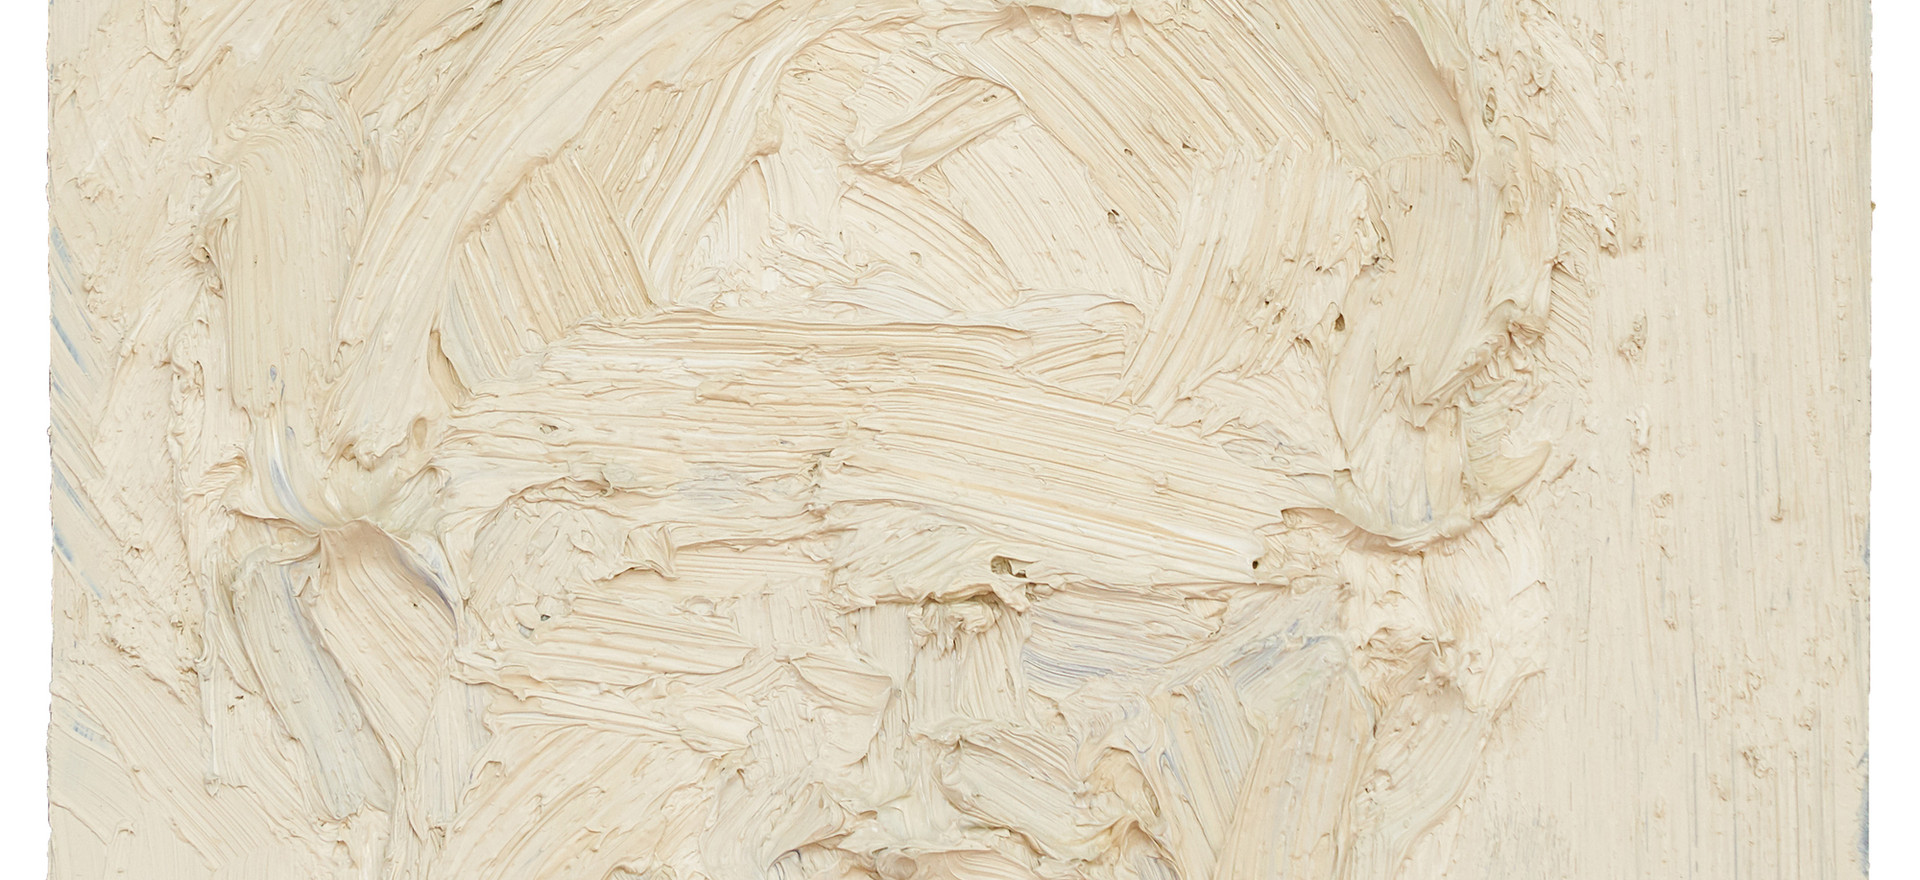 'Brow', 2015, oil on granite, 30.5 x 30.5 x 3 cm